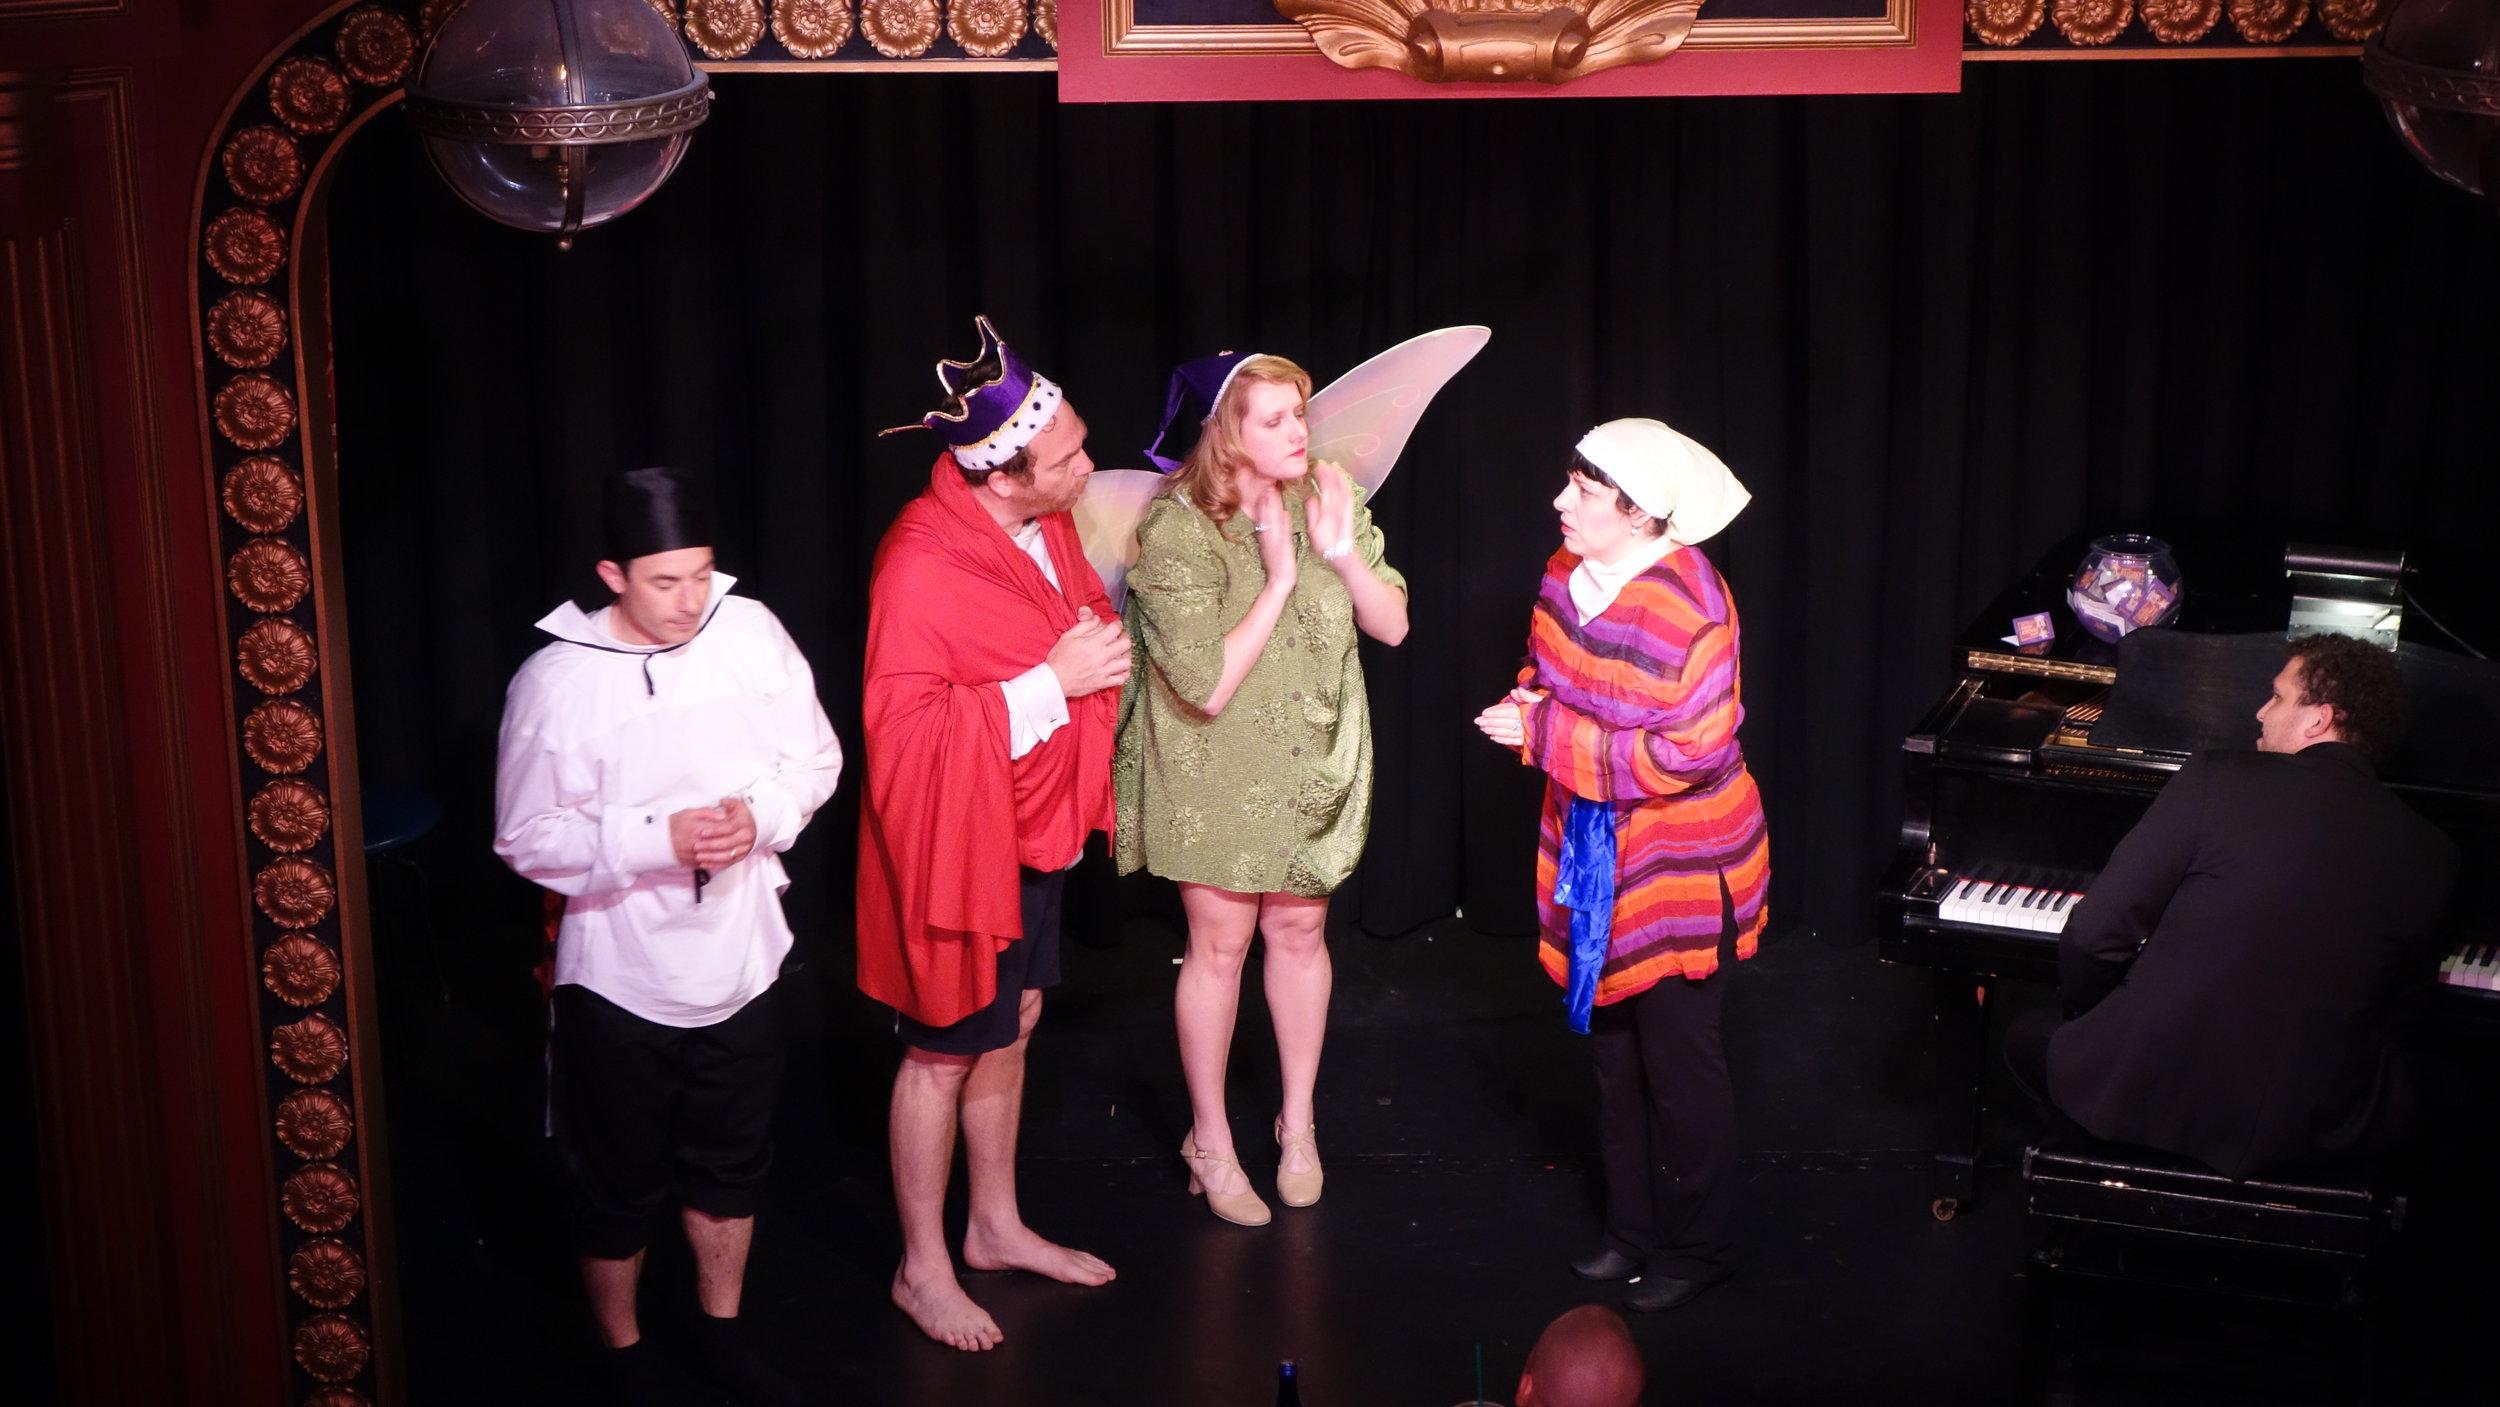 Stefan Schick, Rob Schiffmann, Megan Reilly, Deb Rabbai, and Assaf Gleizner onstage, in character. Photo Credit: Jordan Beisel